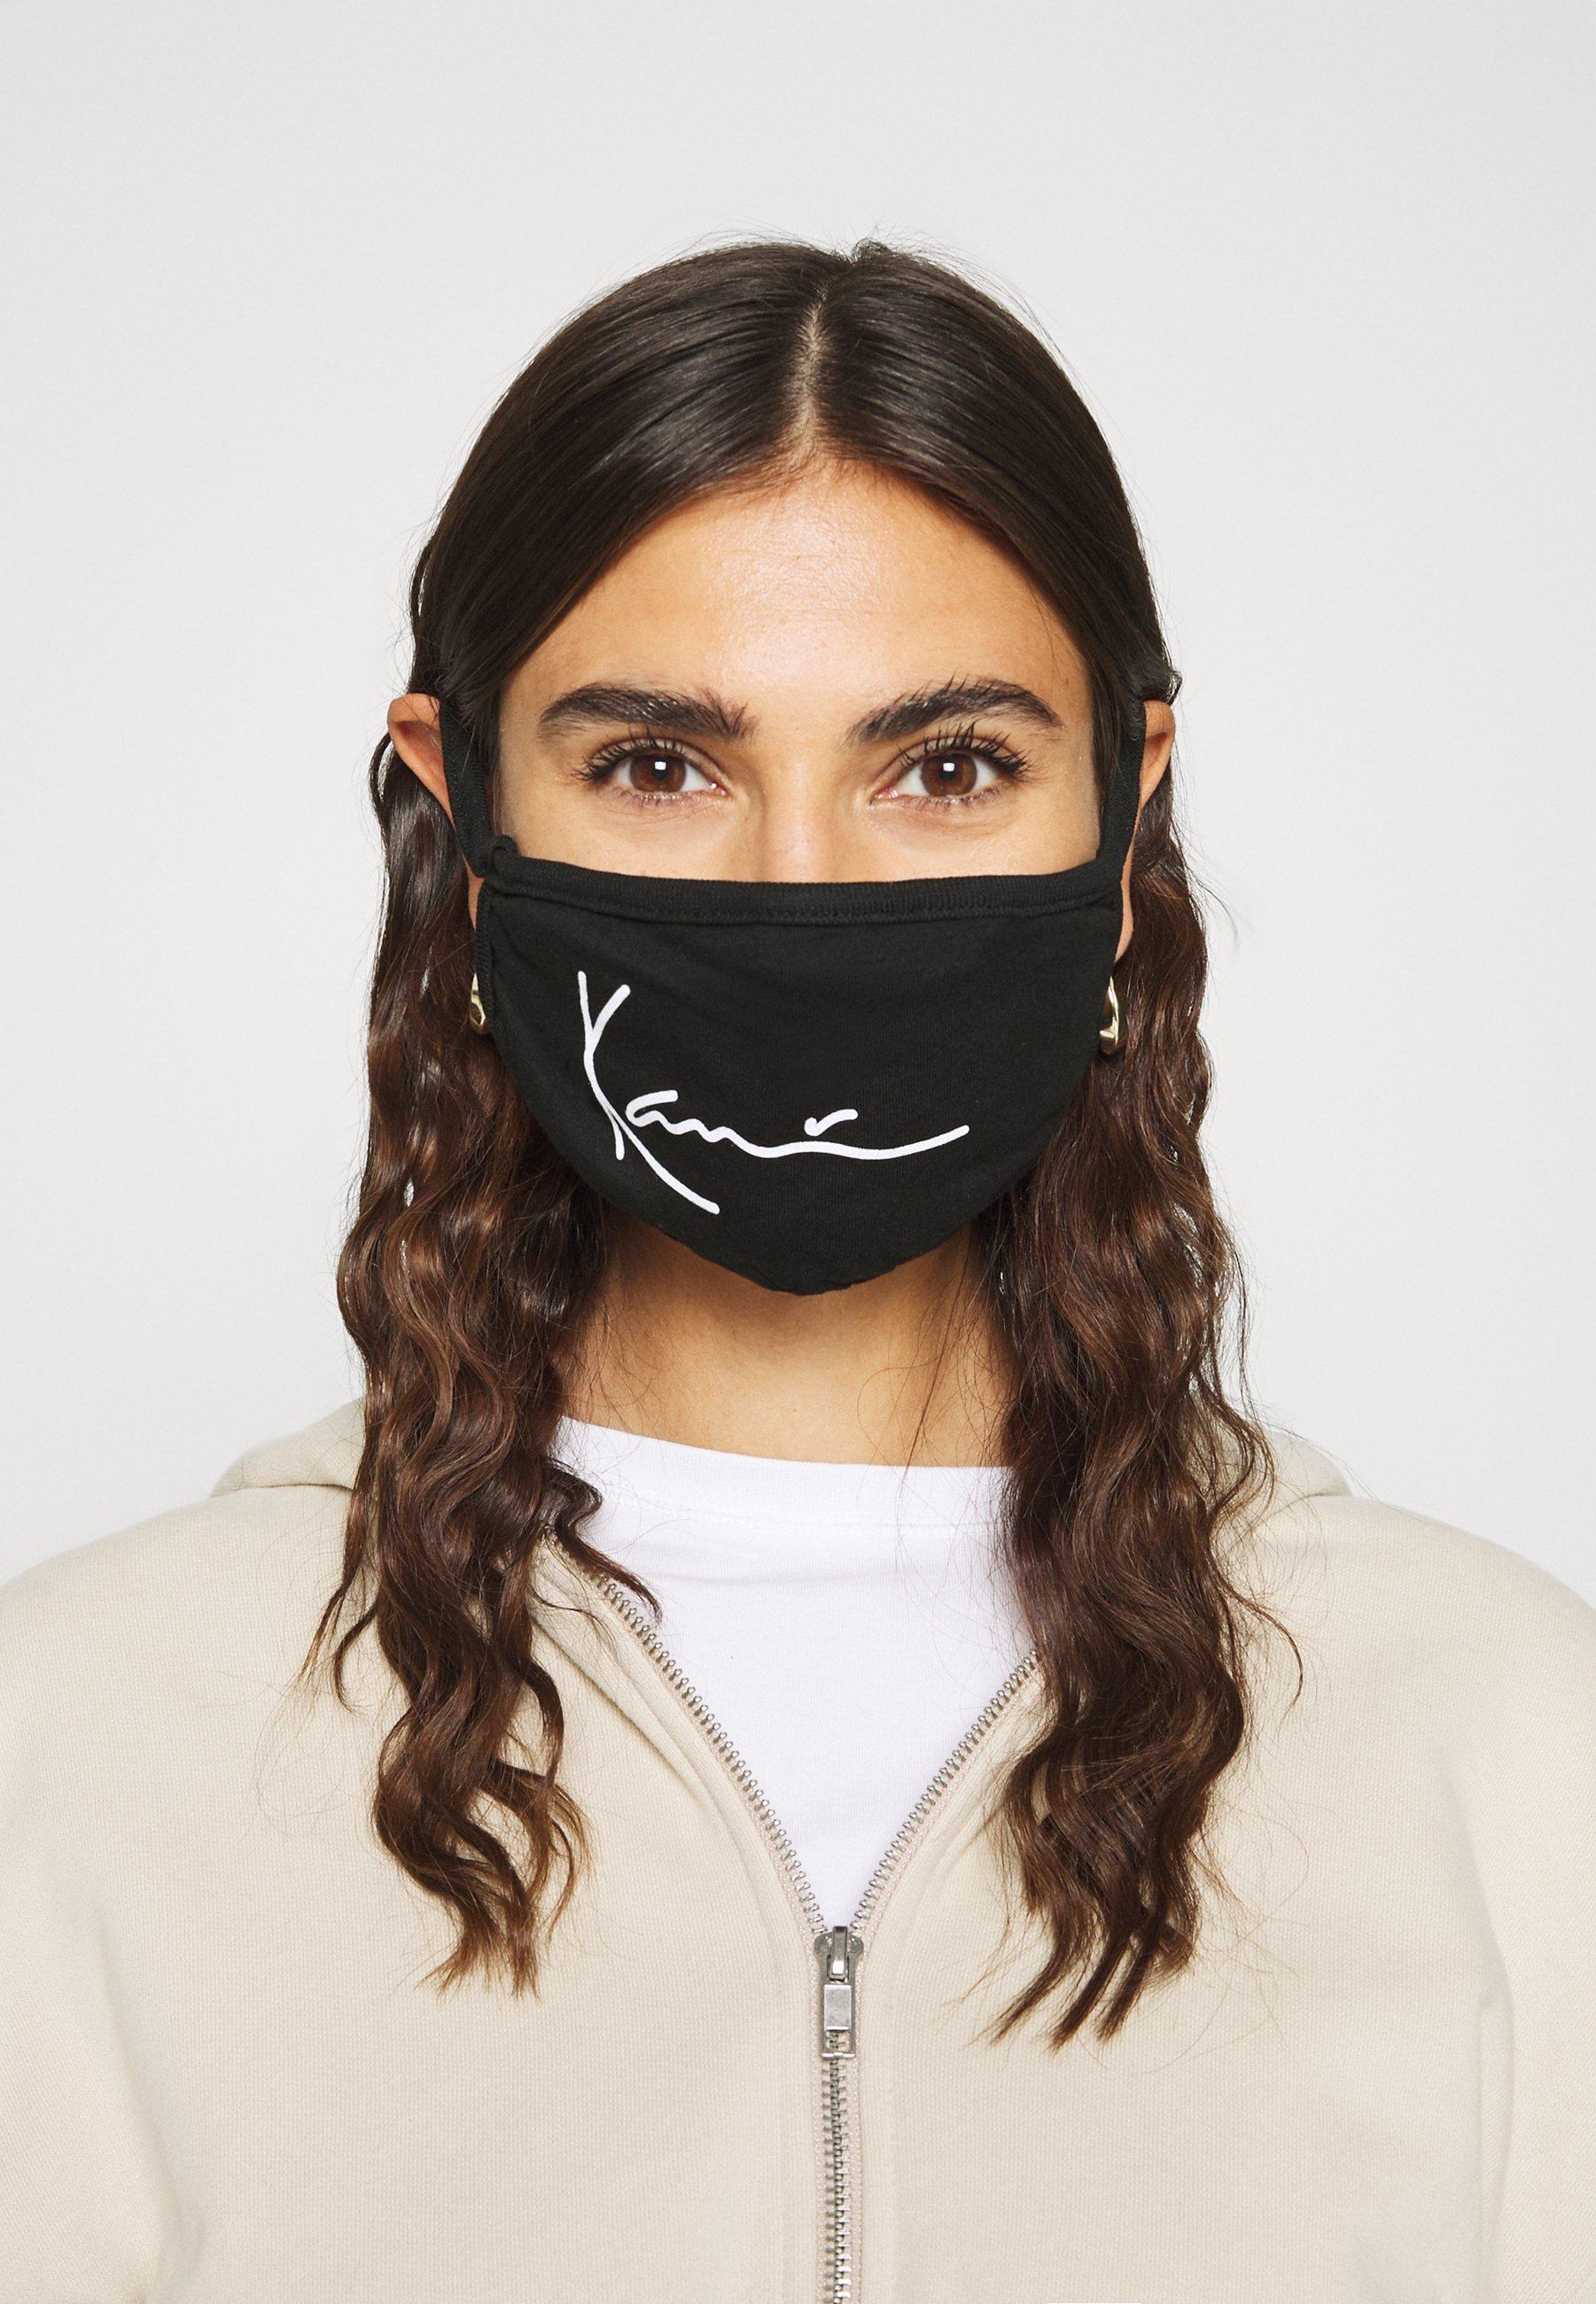 Women SIGNATURE FACE MASK - Community mask